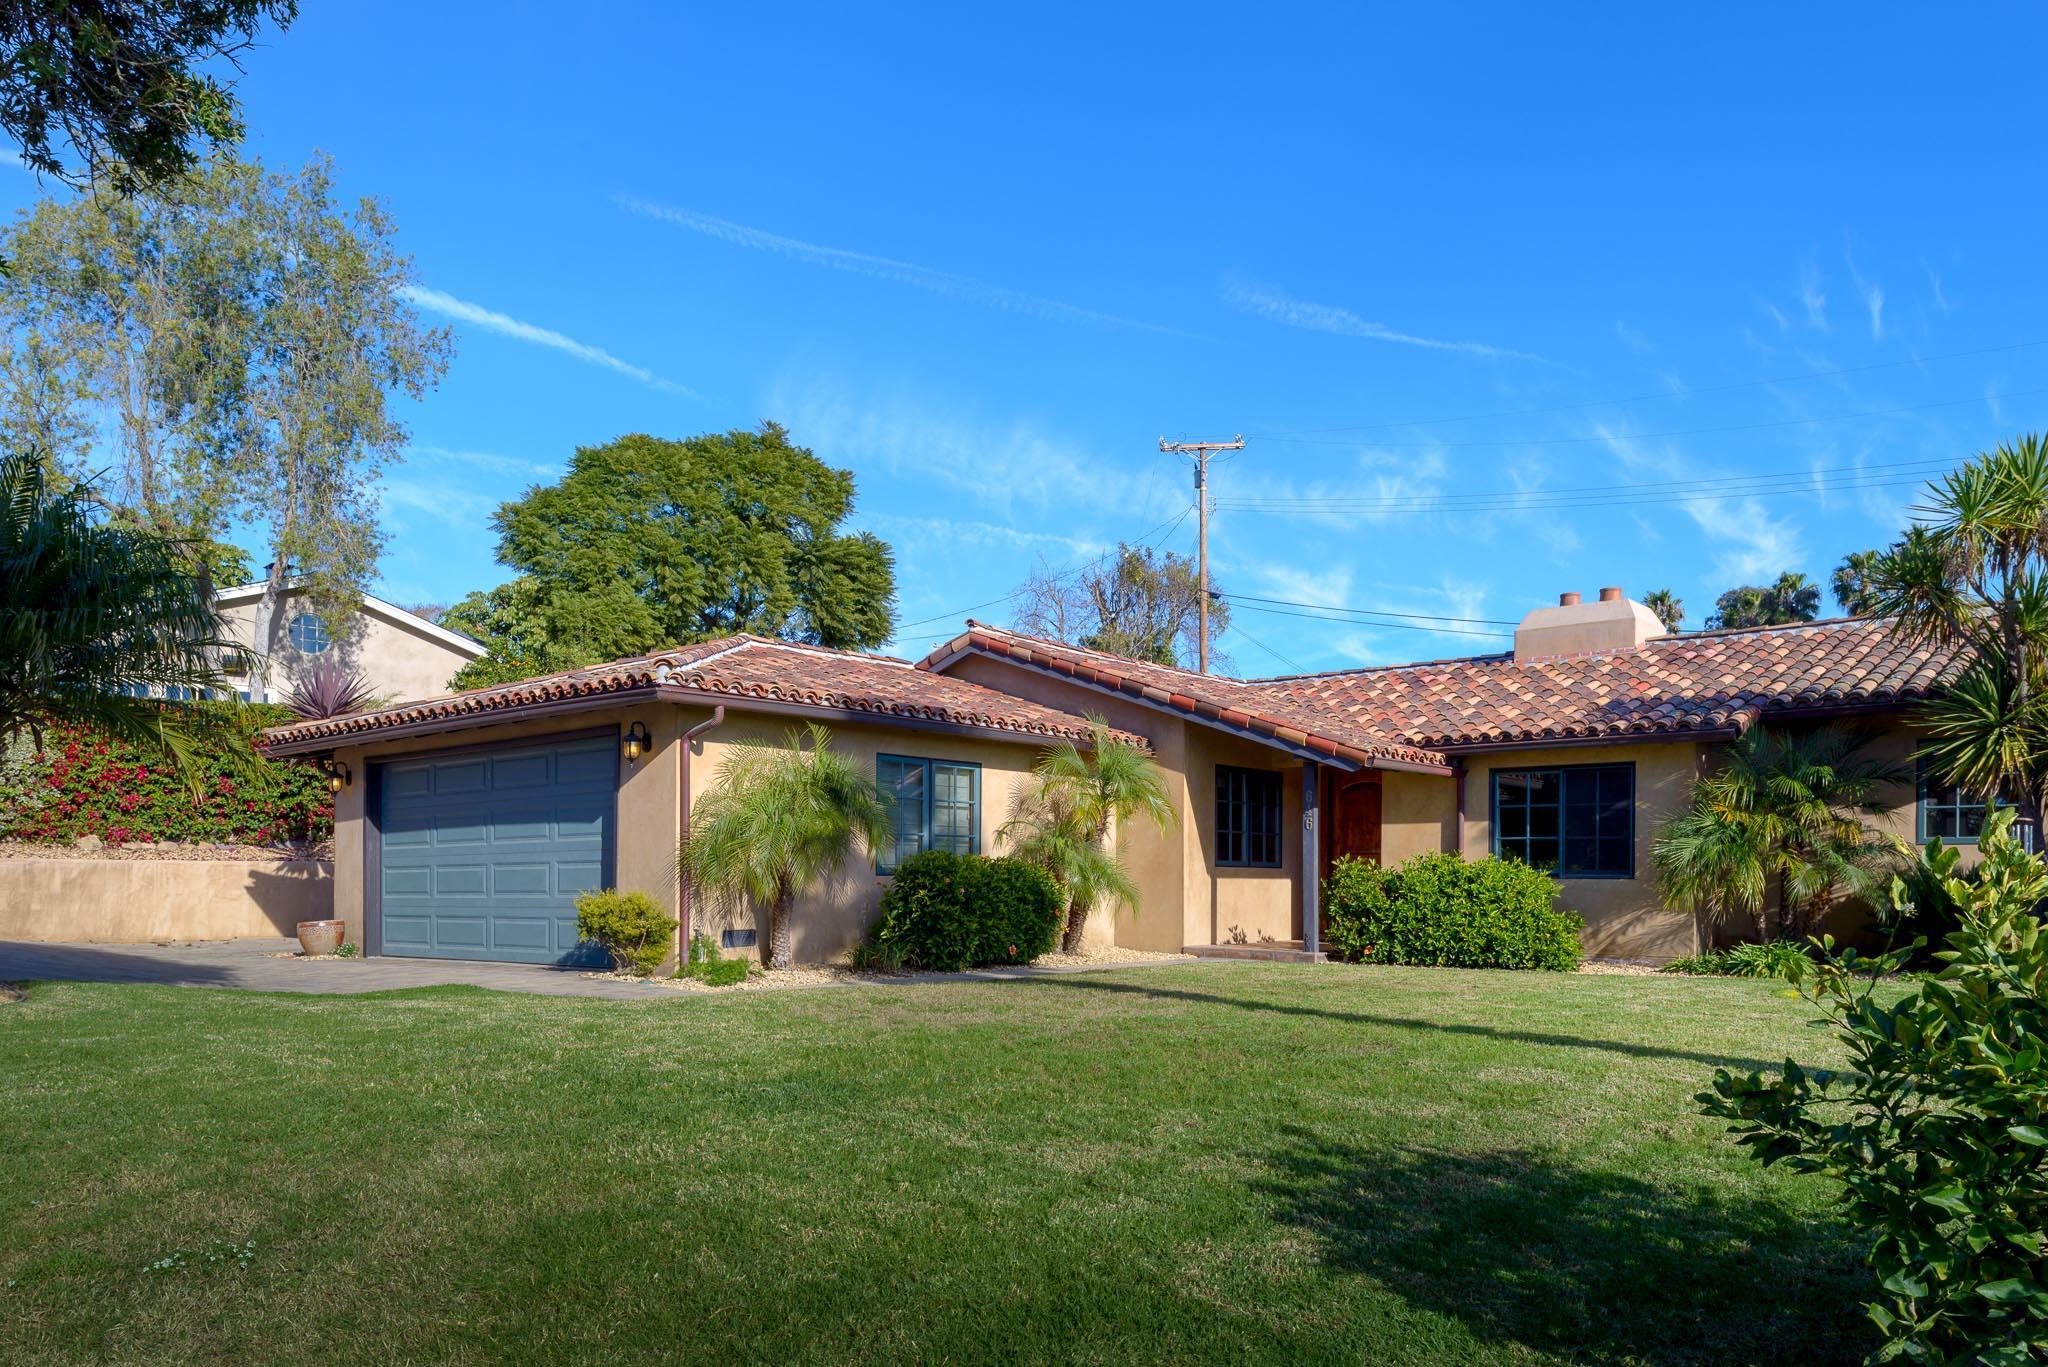 Property photo for 646 Juanita Ave Santa Barbara, California 93109 - 18-4367